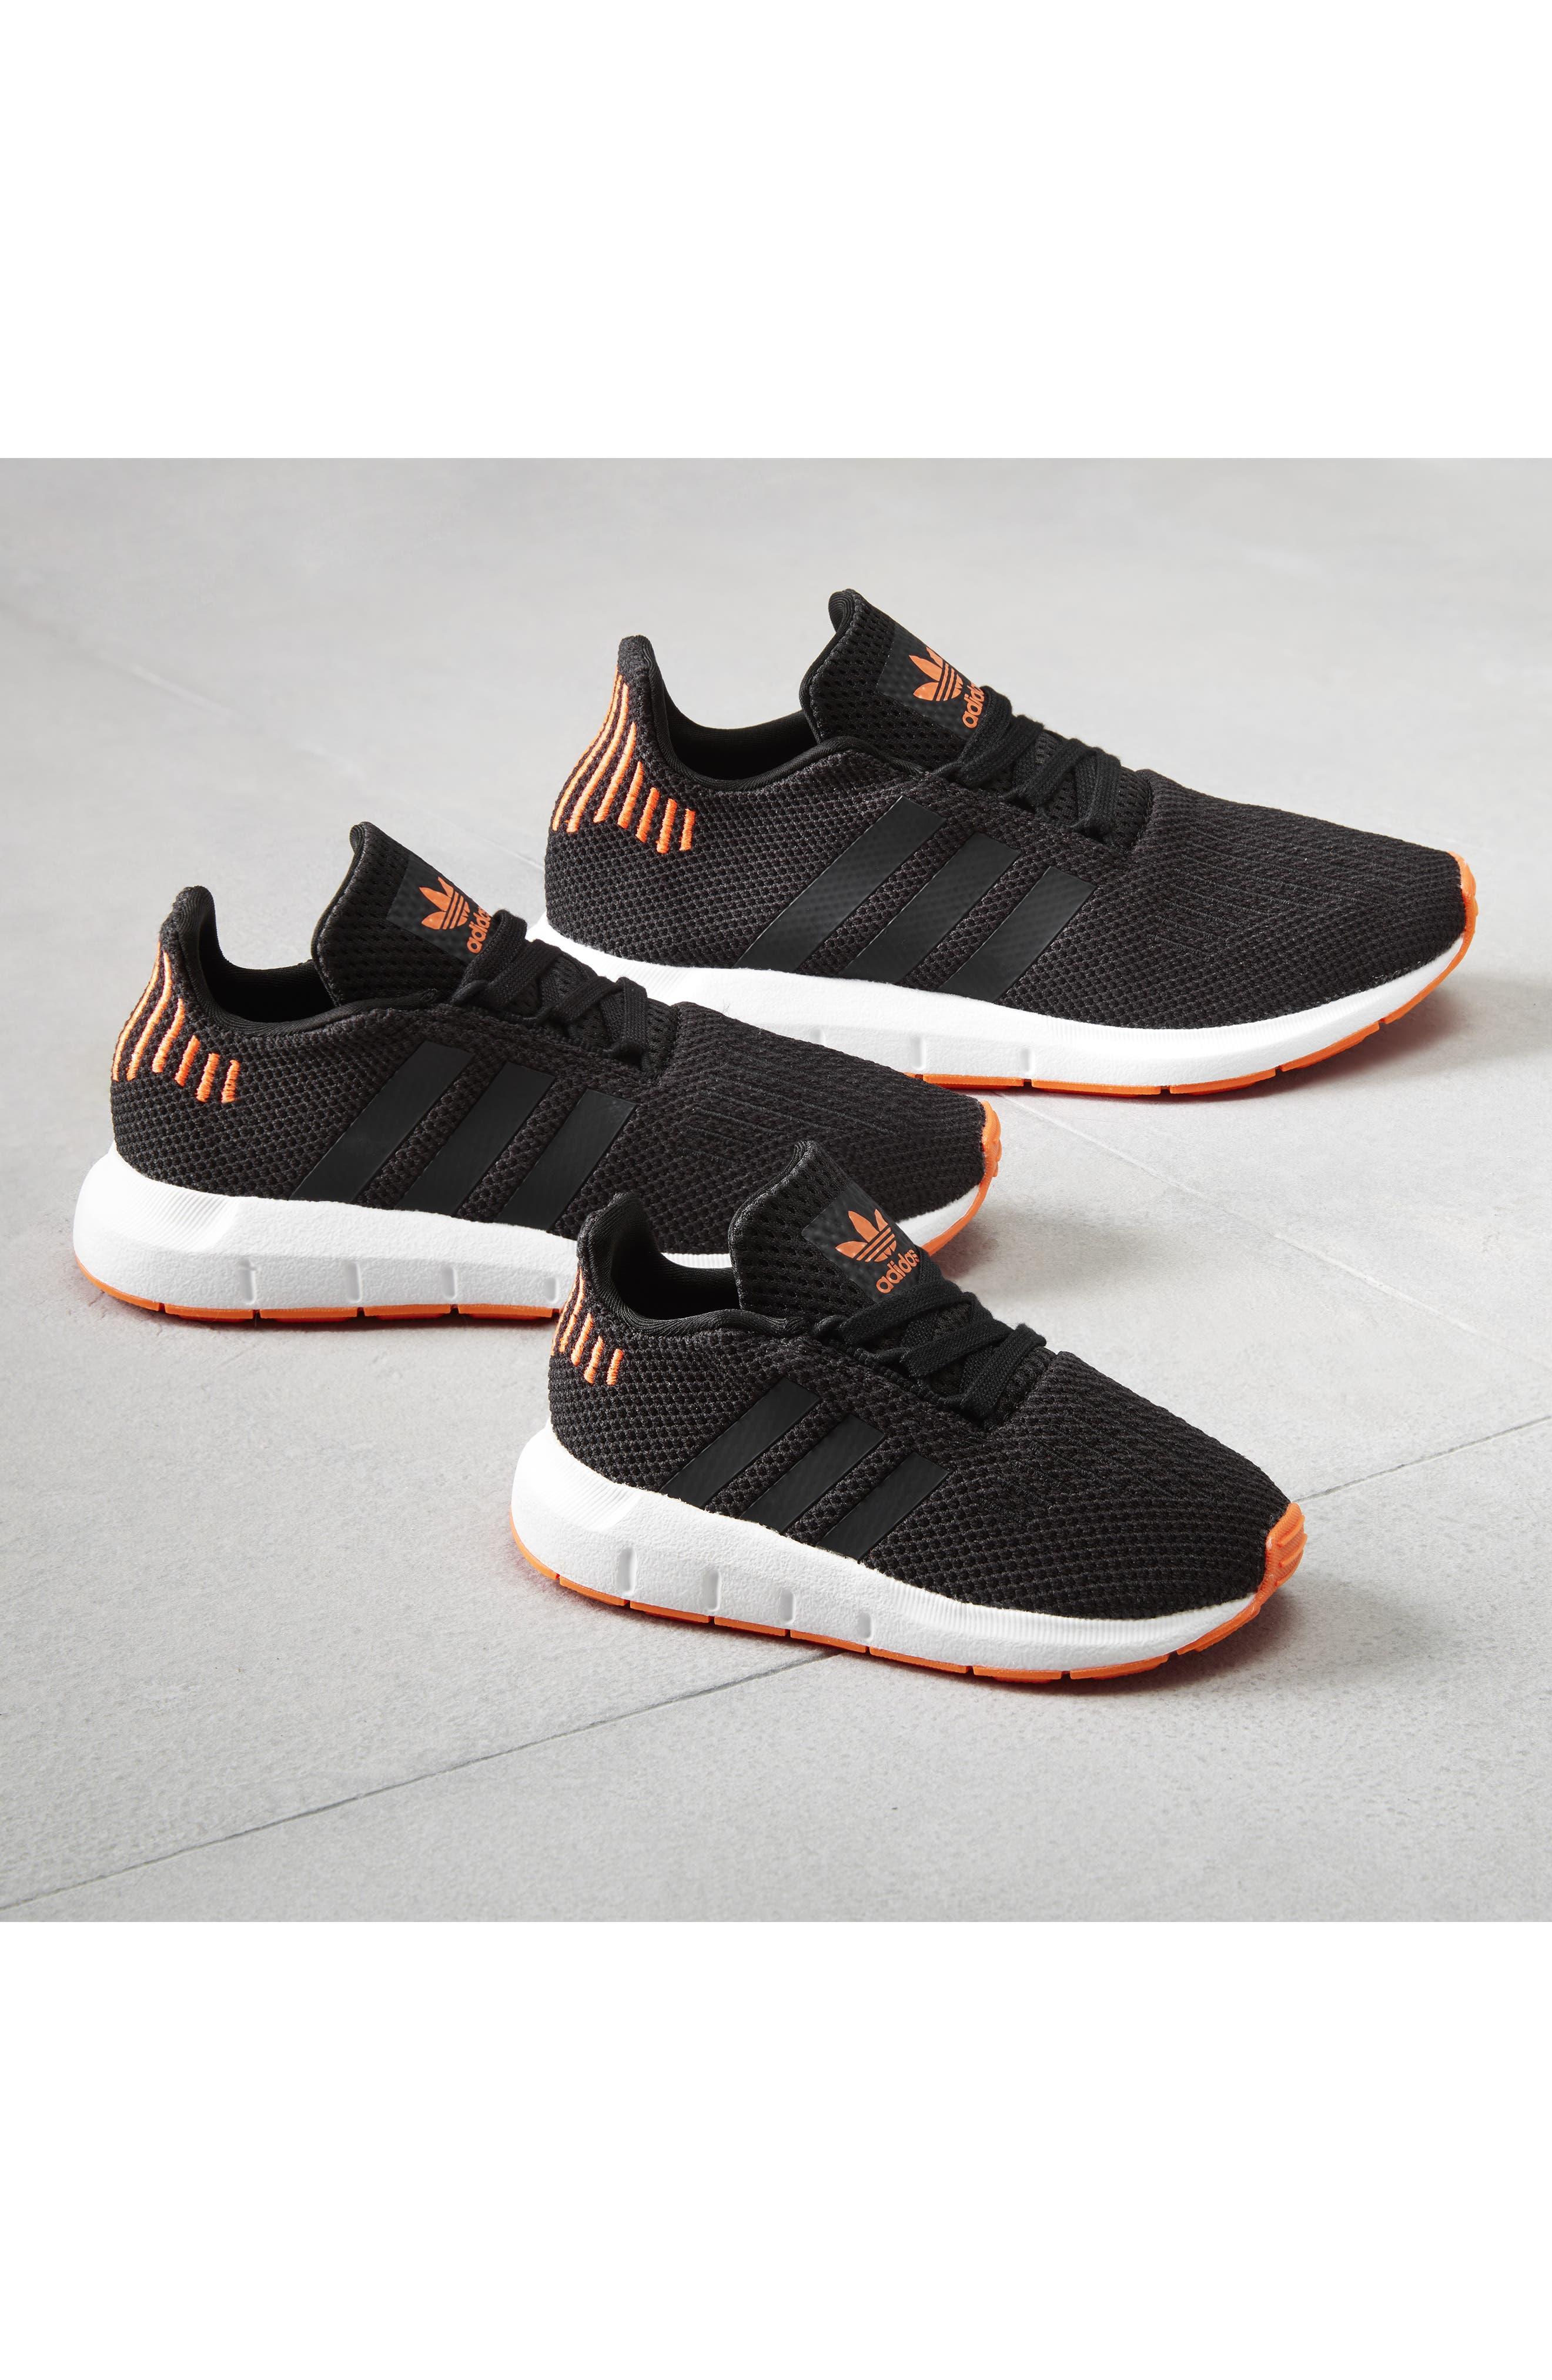 Swift Run J Sneaker,                             Alternate thumbnail 15, color,                             SEMI SOLAR PINK/ WHITE